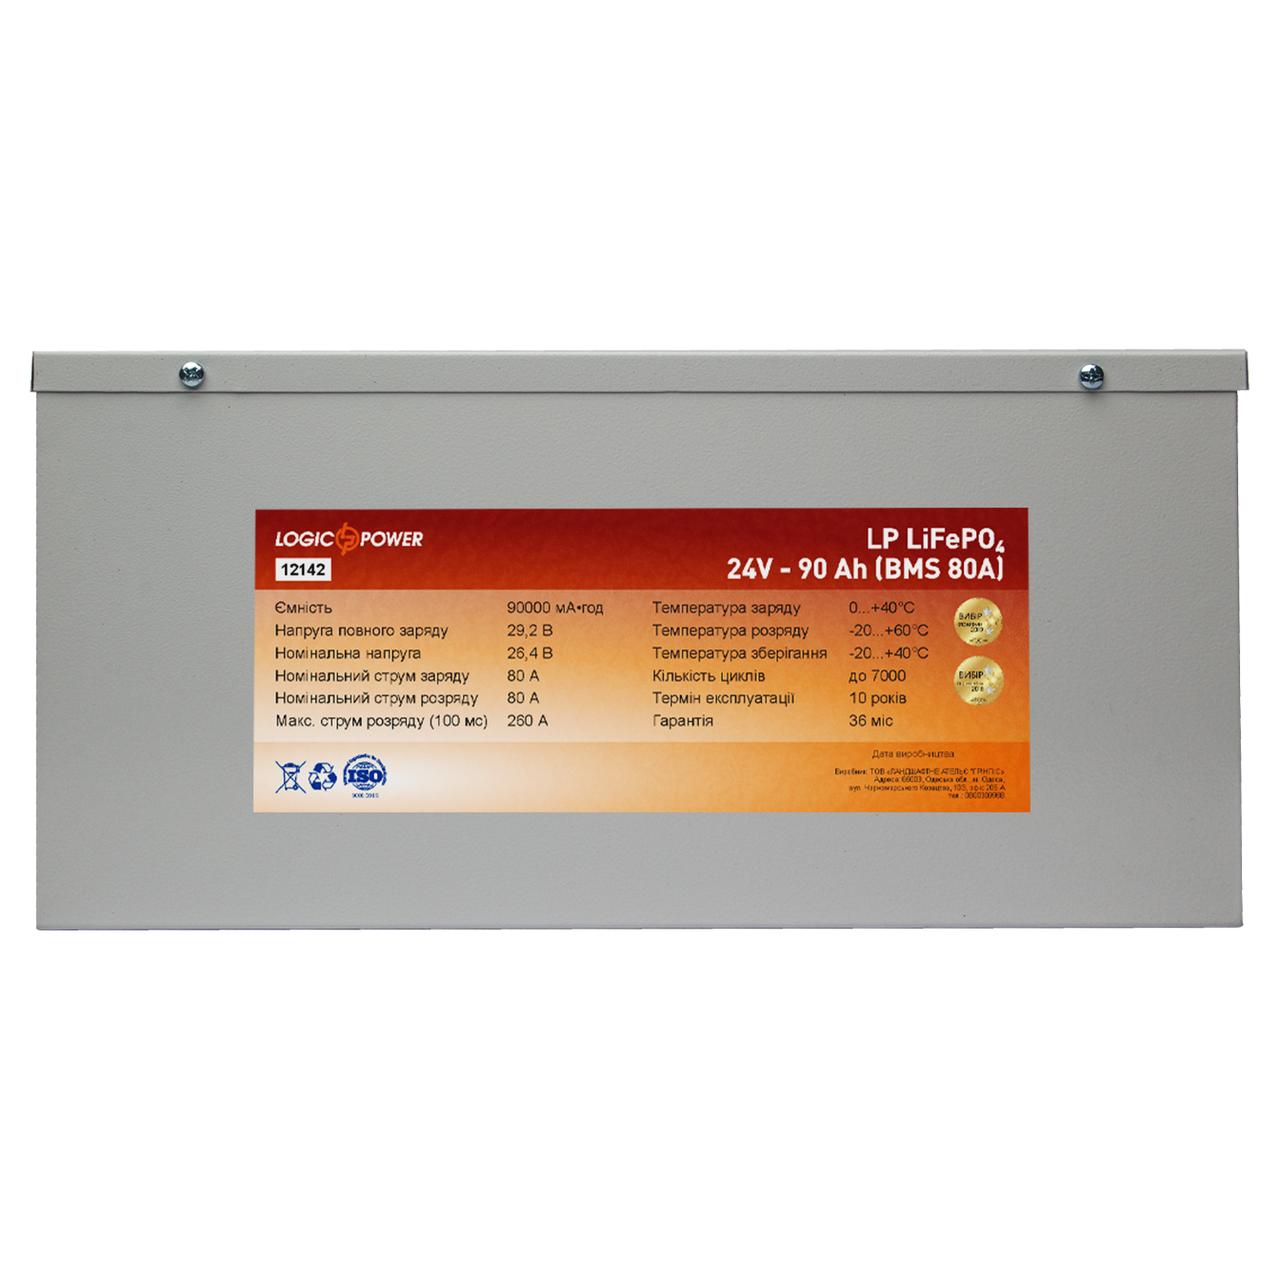 Аккумулятор LP LiFePO4 24 V - 90 Ah (BMS 80A) металл